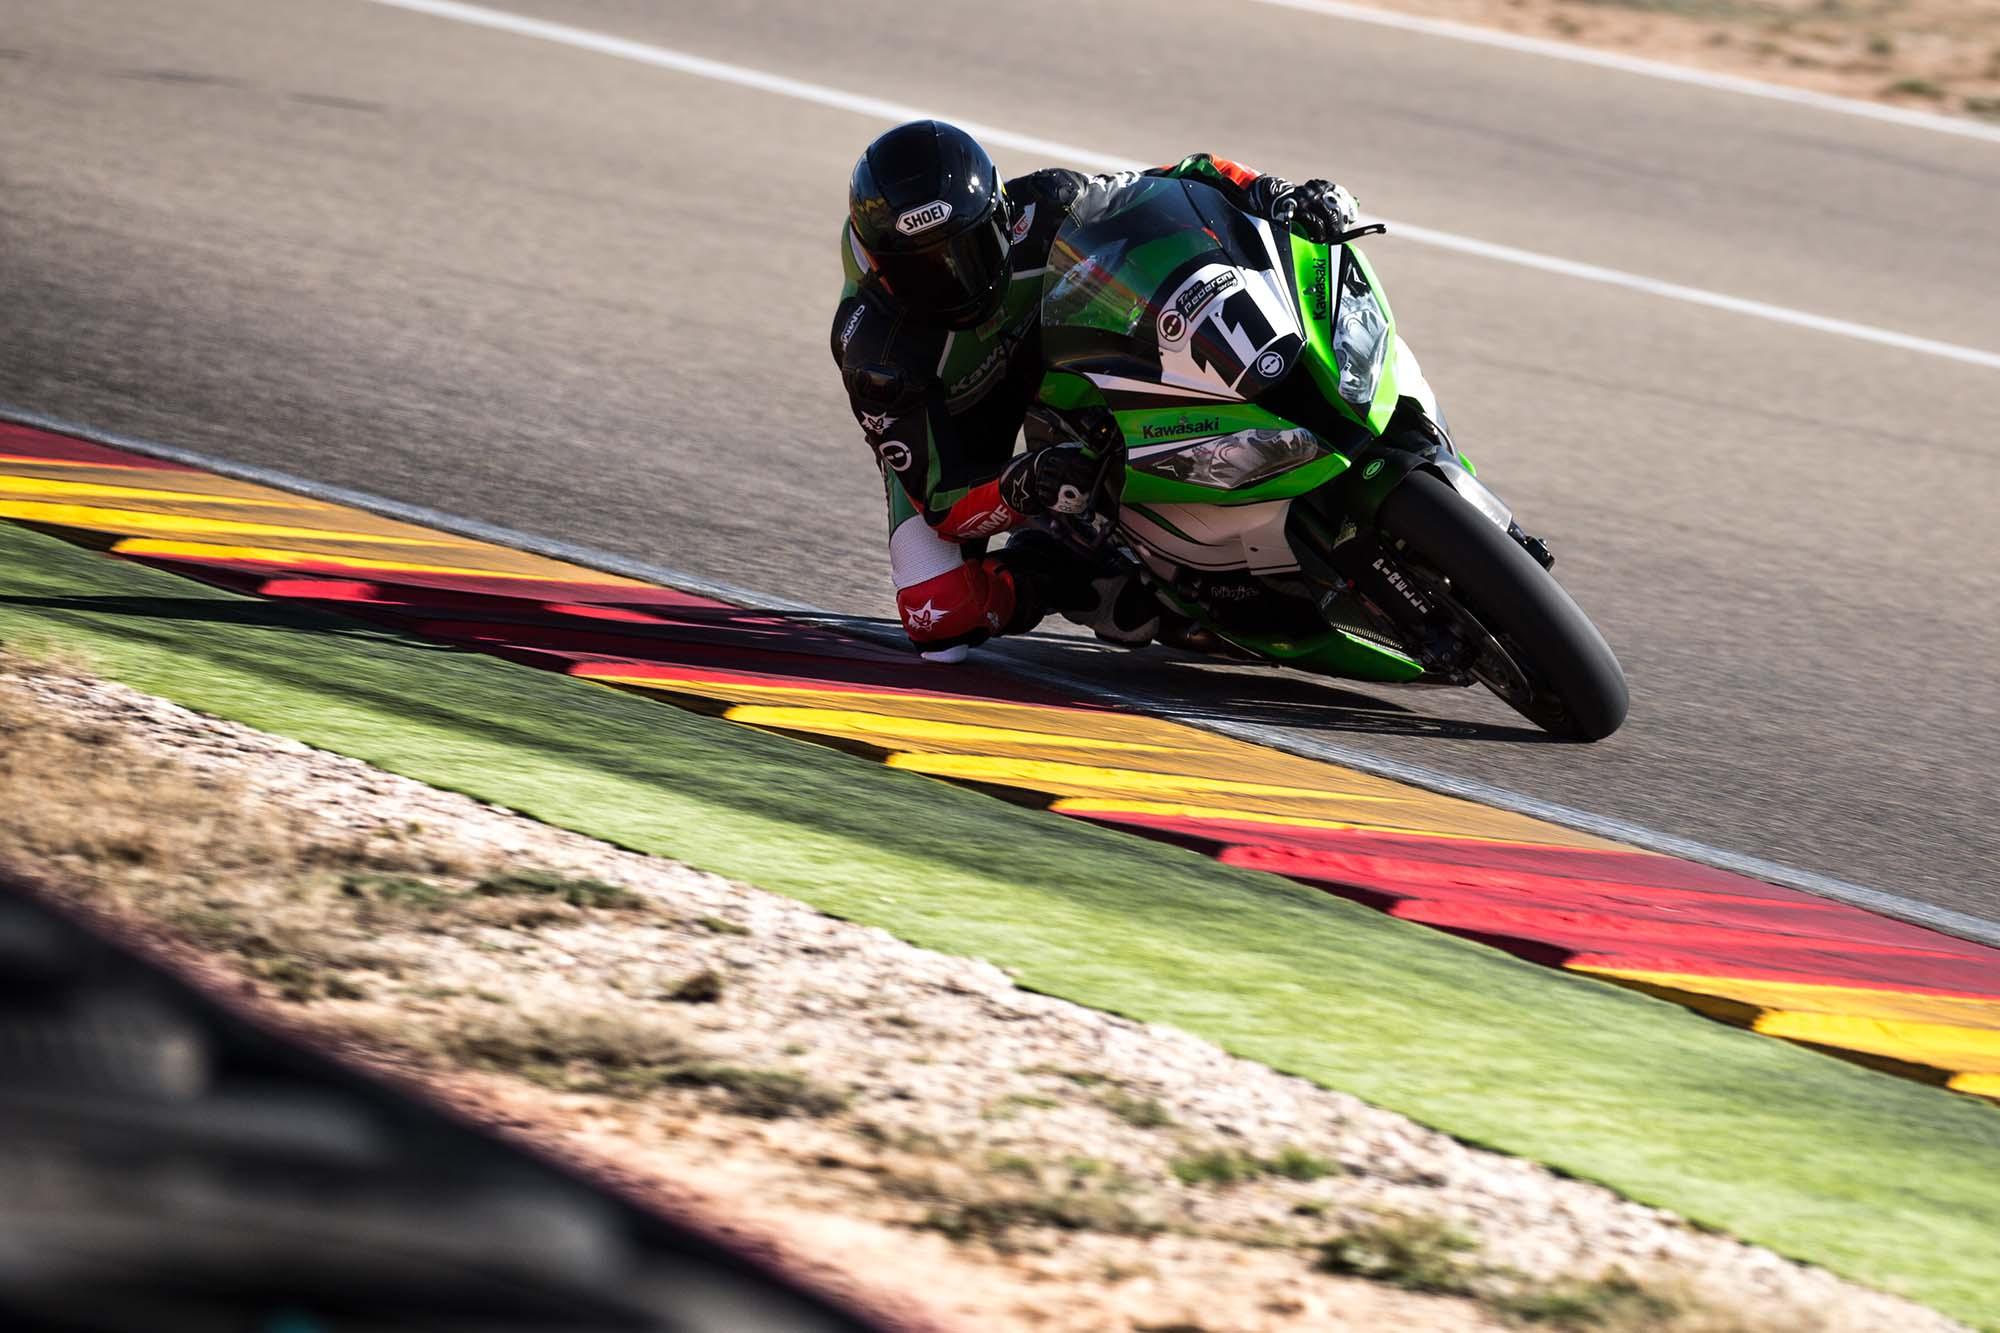 Motogp Video Pass No Spoiler   MotoGP 2017 Info, Video, Points Table